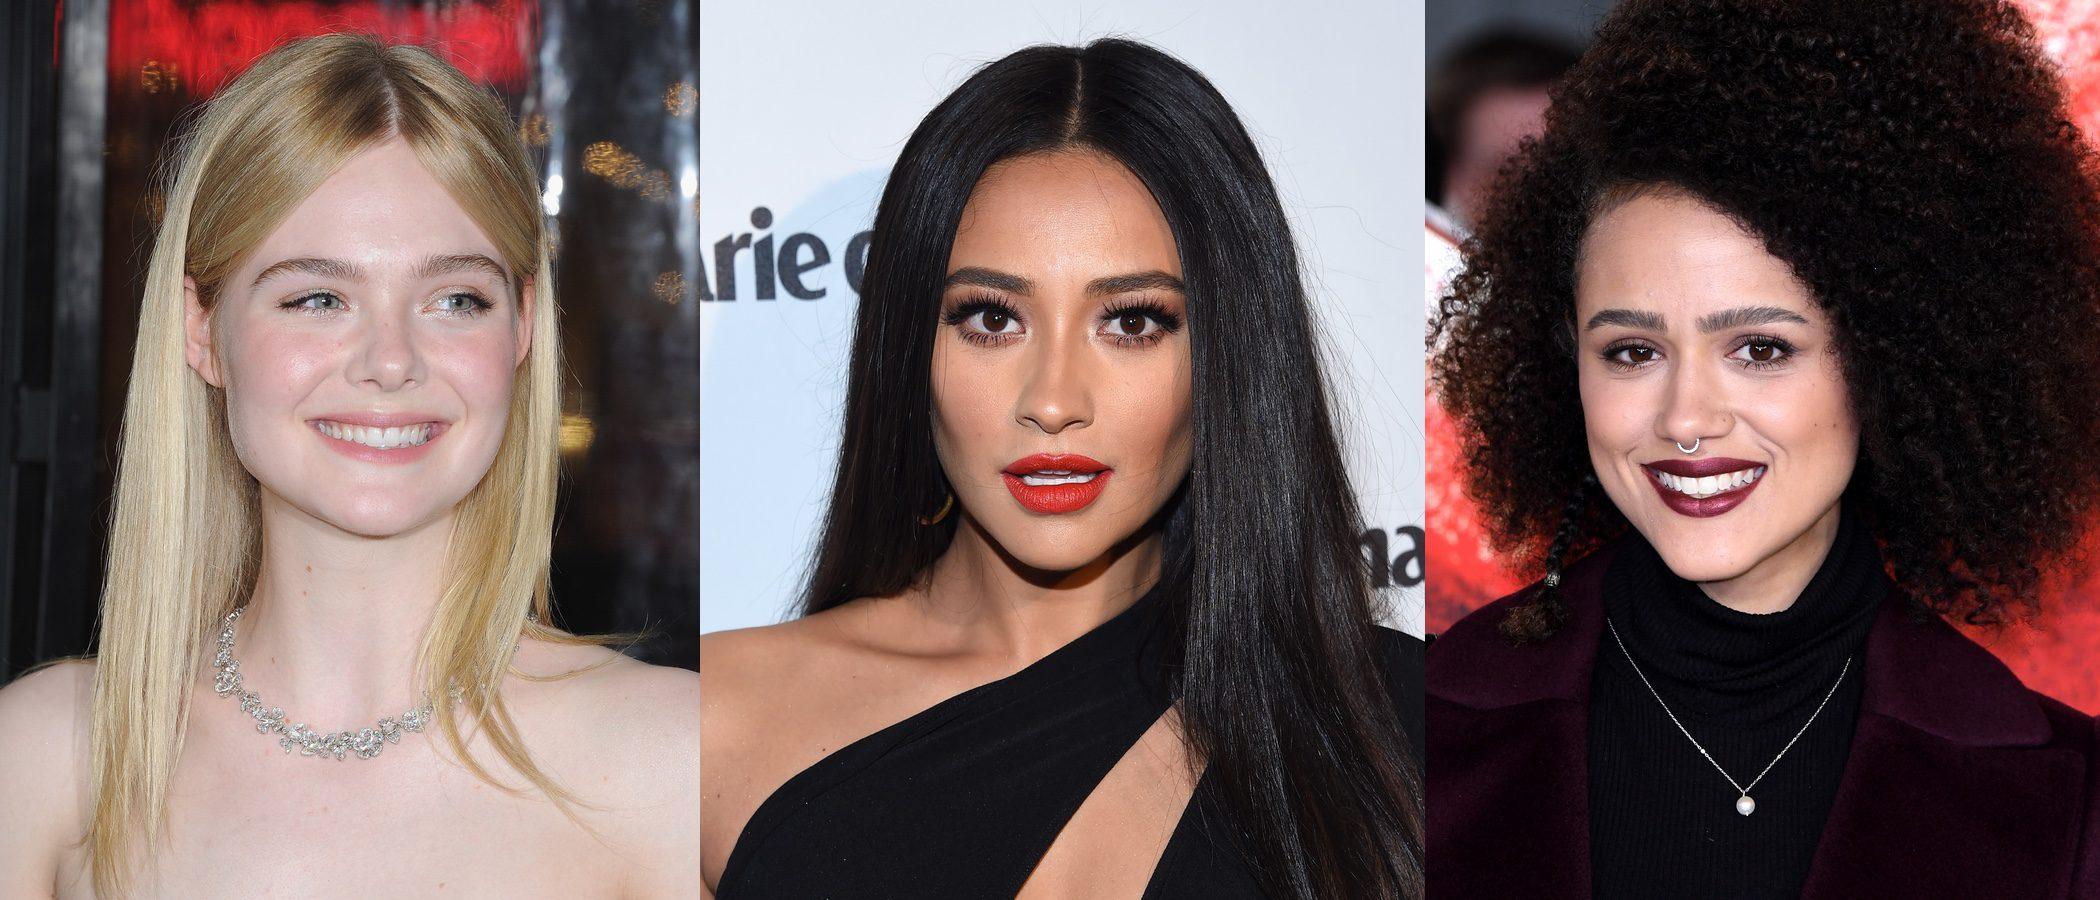 Elle Fanning, Shay Mitchell y Nathalie Emmanuel triunfan entre los mejores beauty looks de la semana